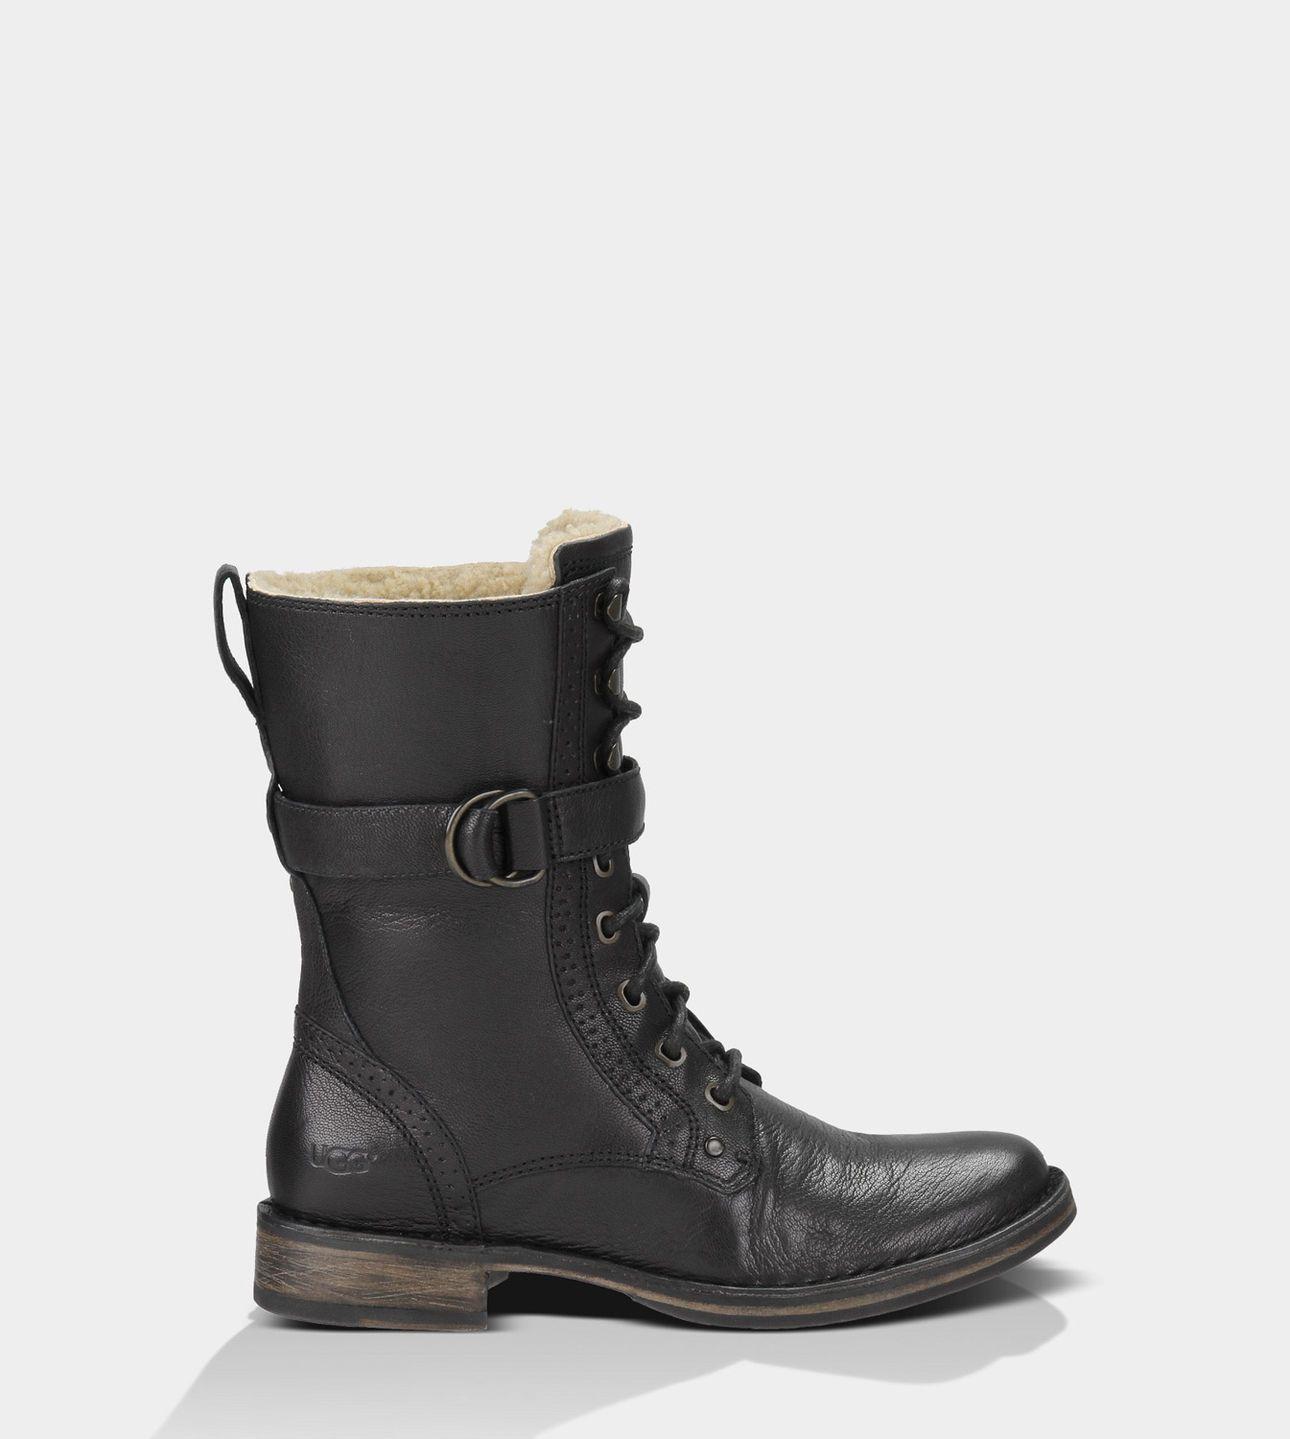 Jena Ugg Boots